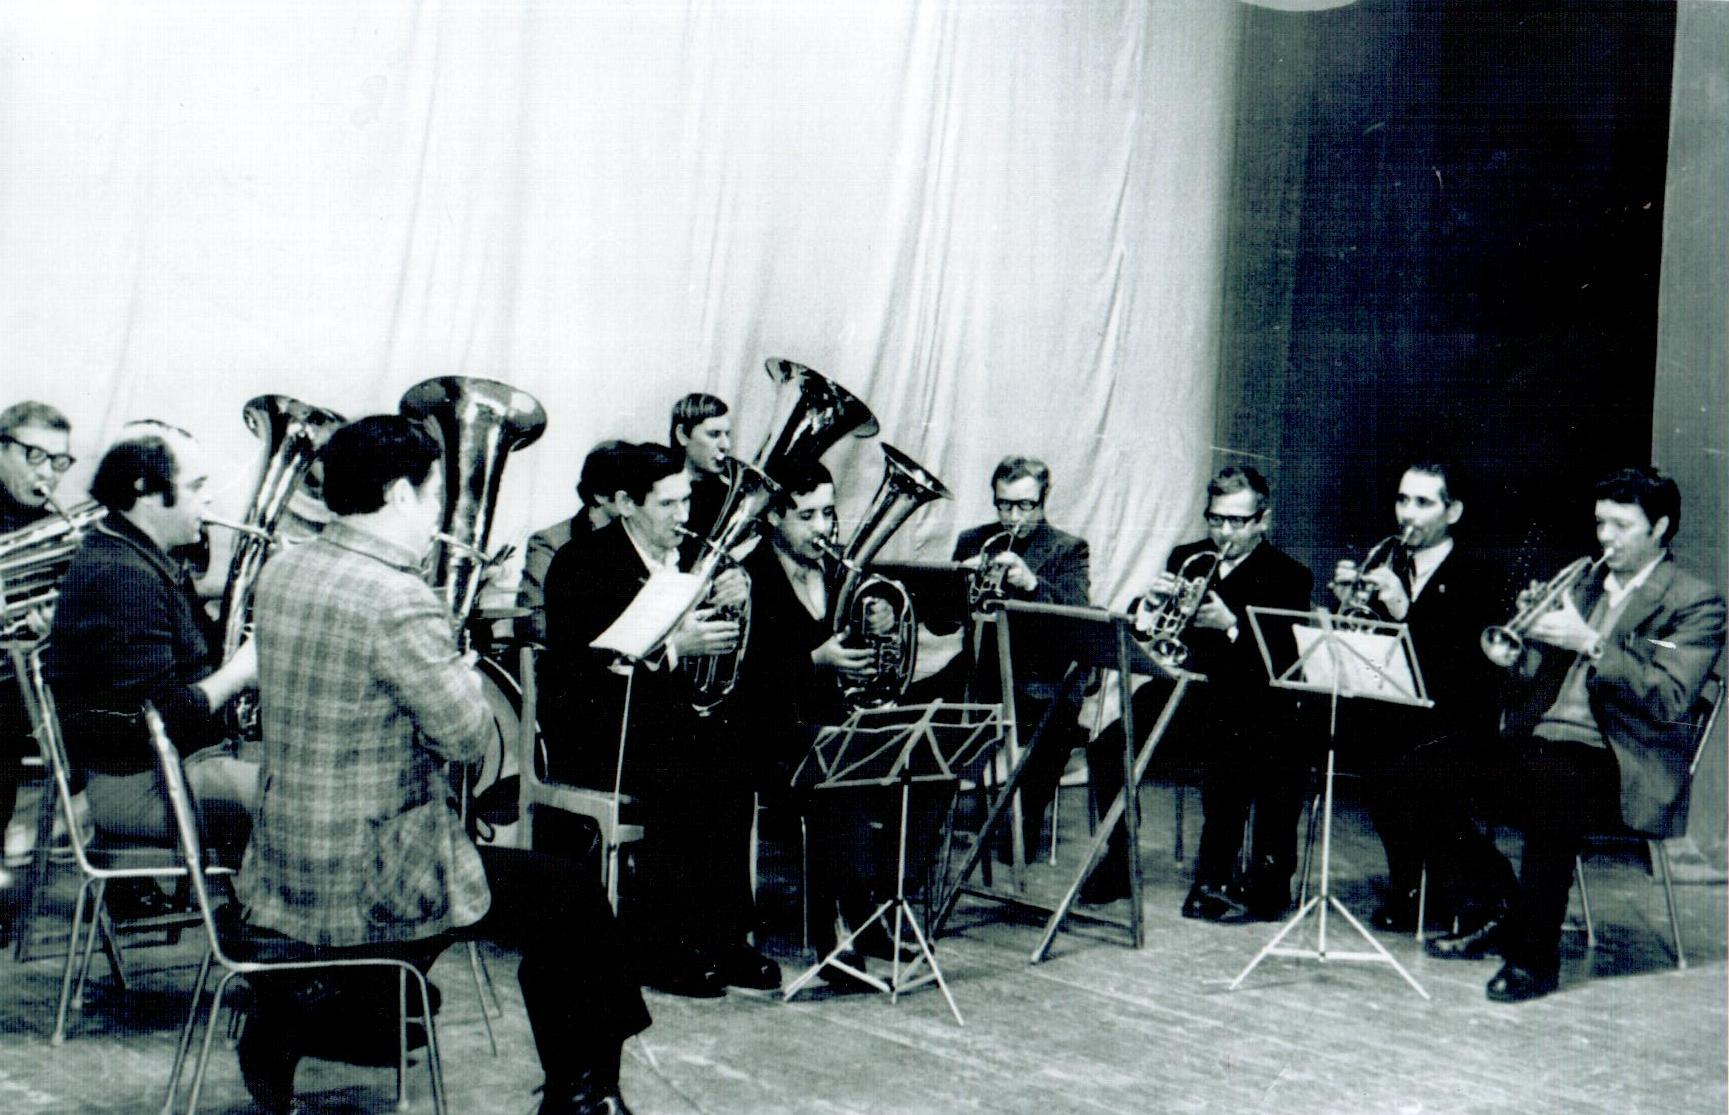 духовой оркестр автоцеха ЧМЗ на сцене ДКМ